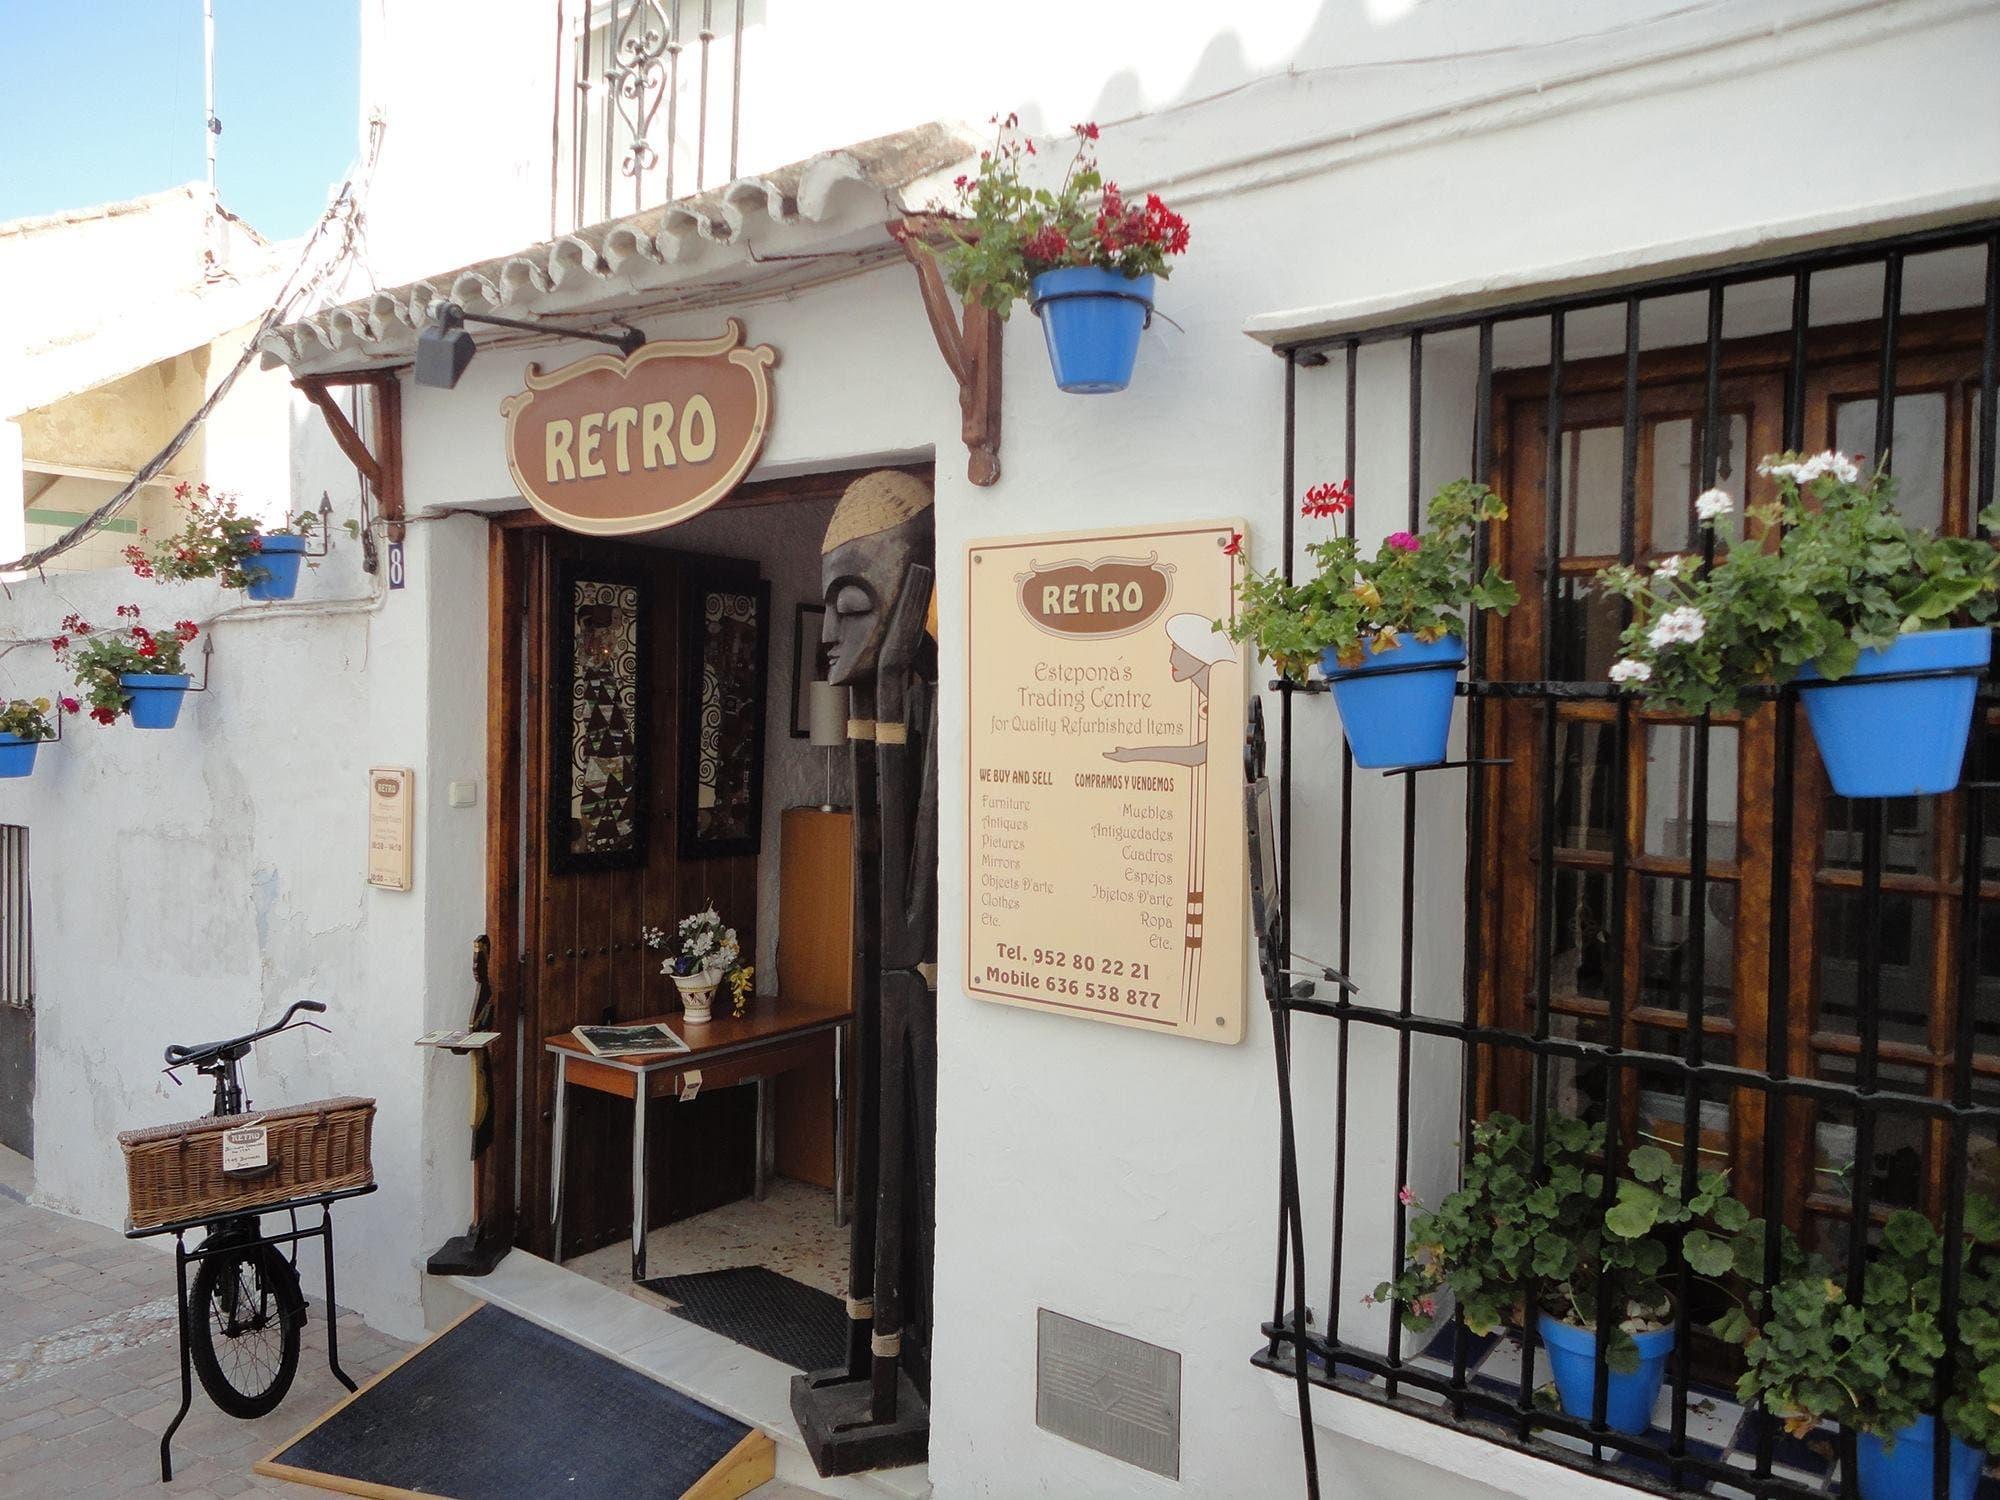 Expat Business Success At Vintage Shop Retro In Estepona Olive